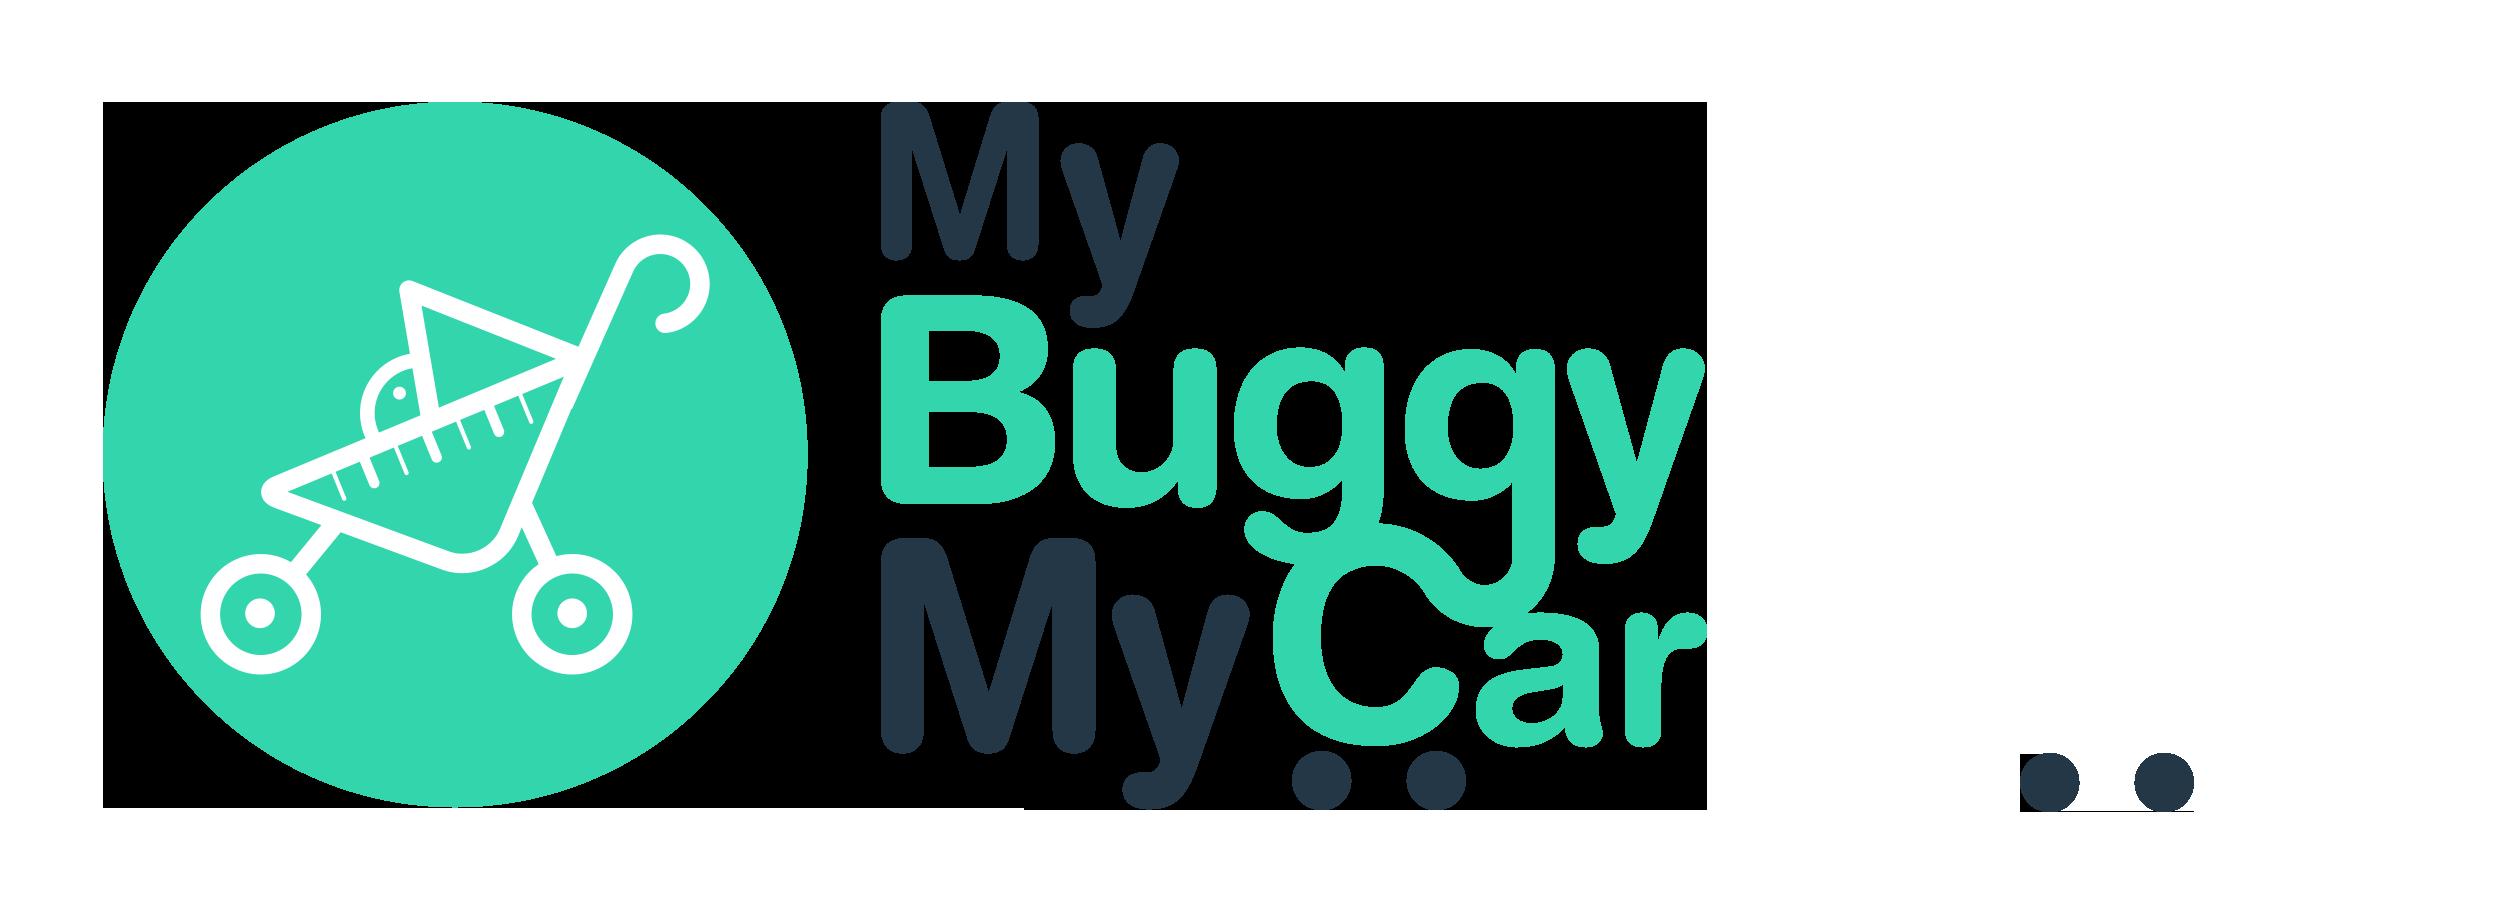 My Buggy My Car Blog